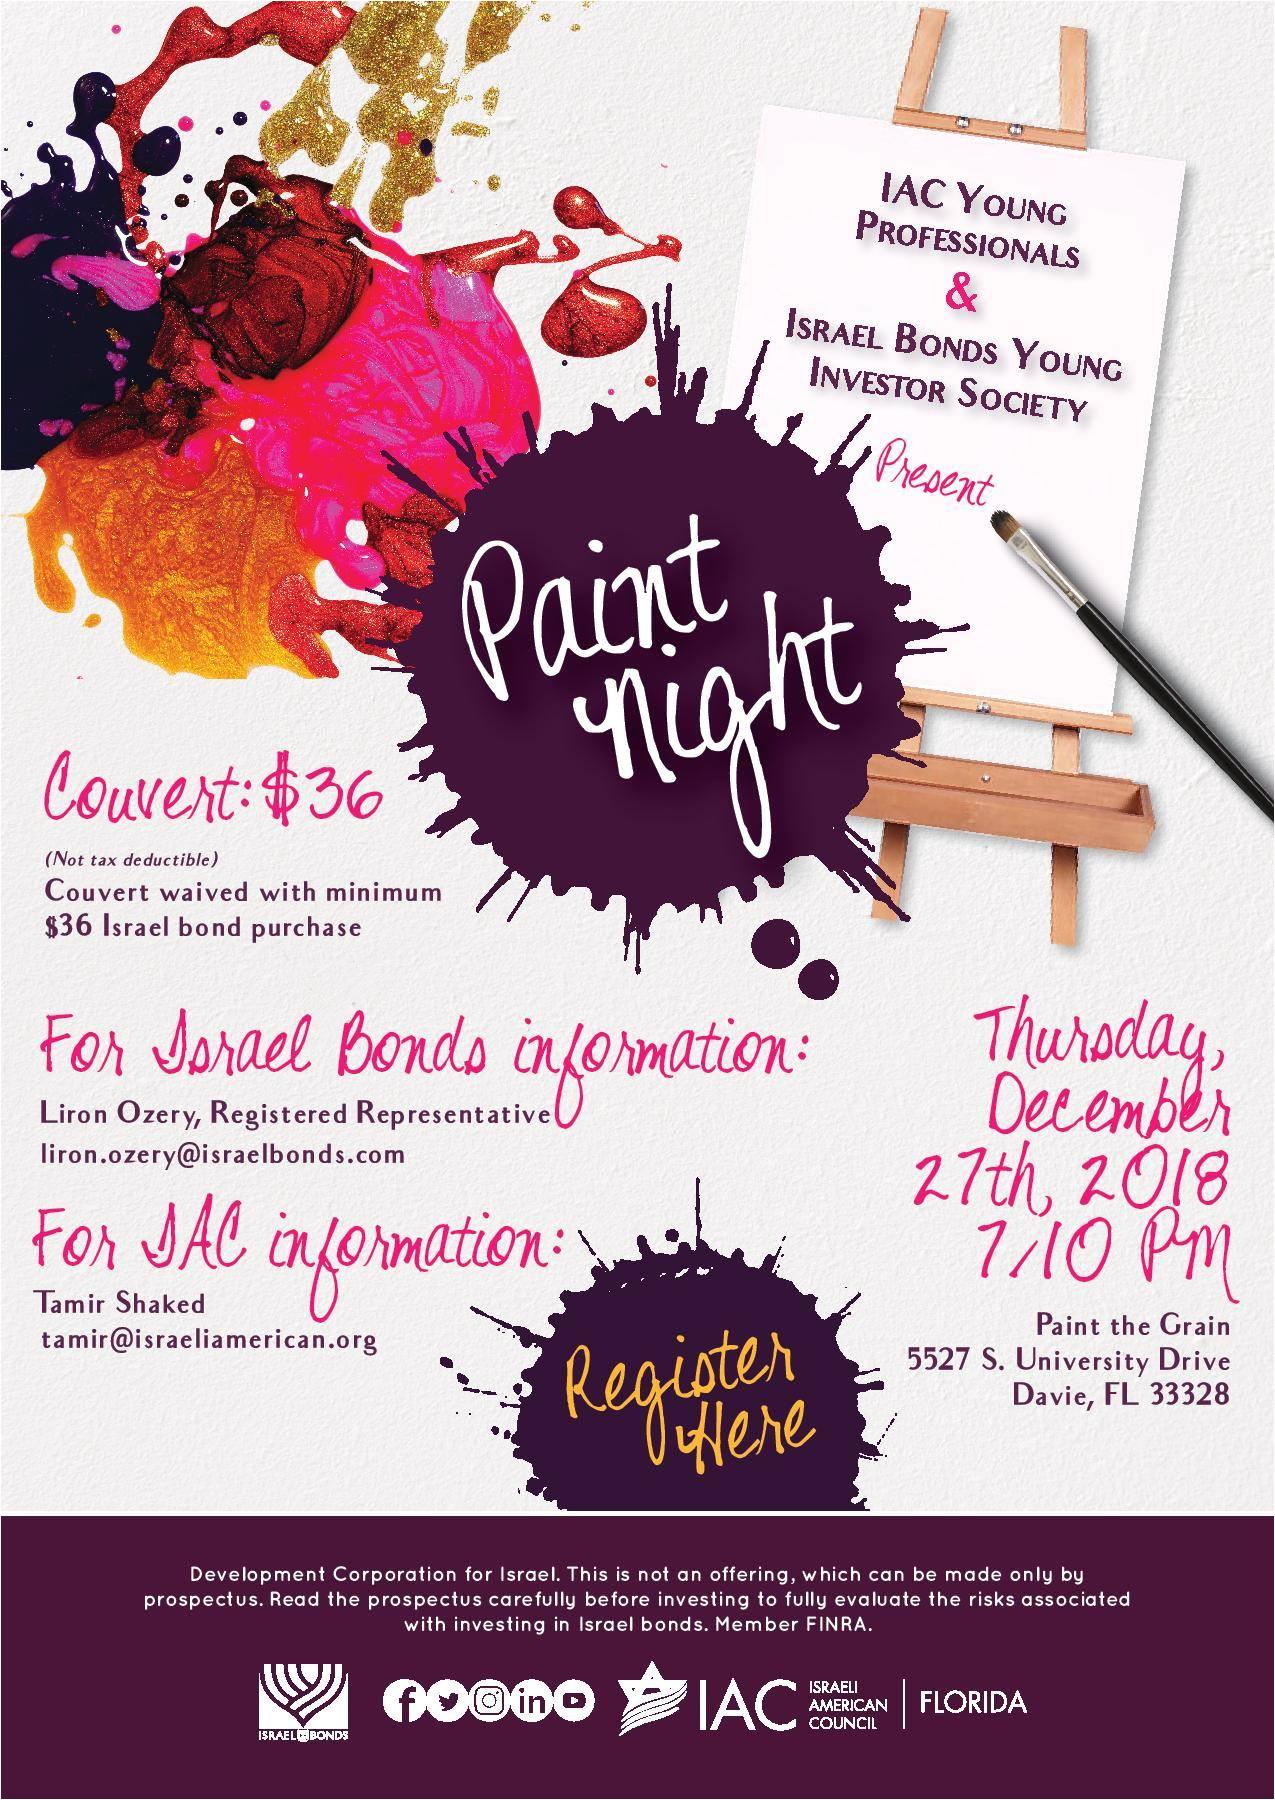 wine paint night paint the grain studio wood sign paint sip events